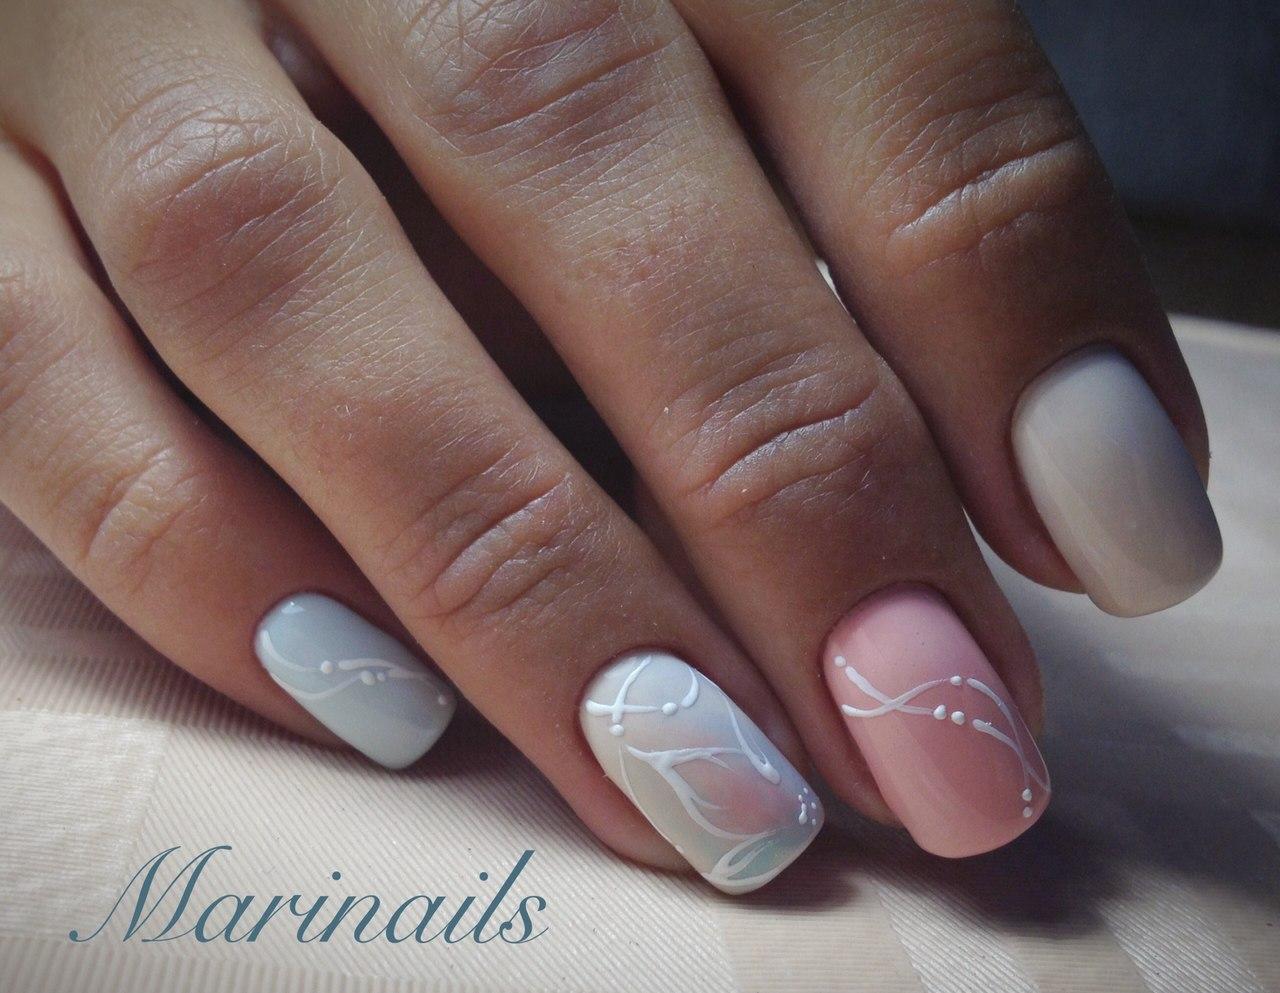 Manicure by summer dress